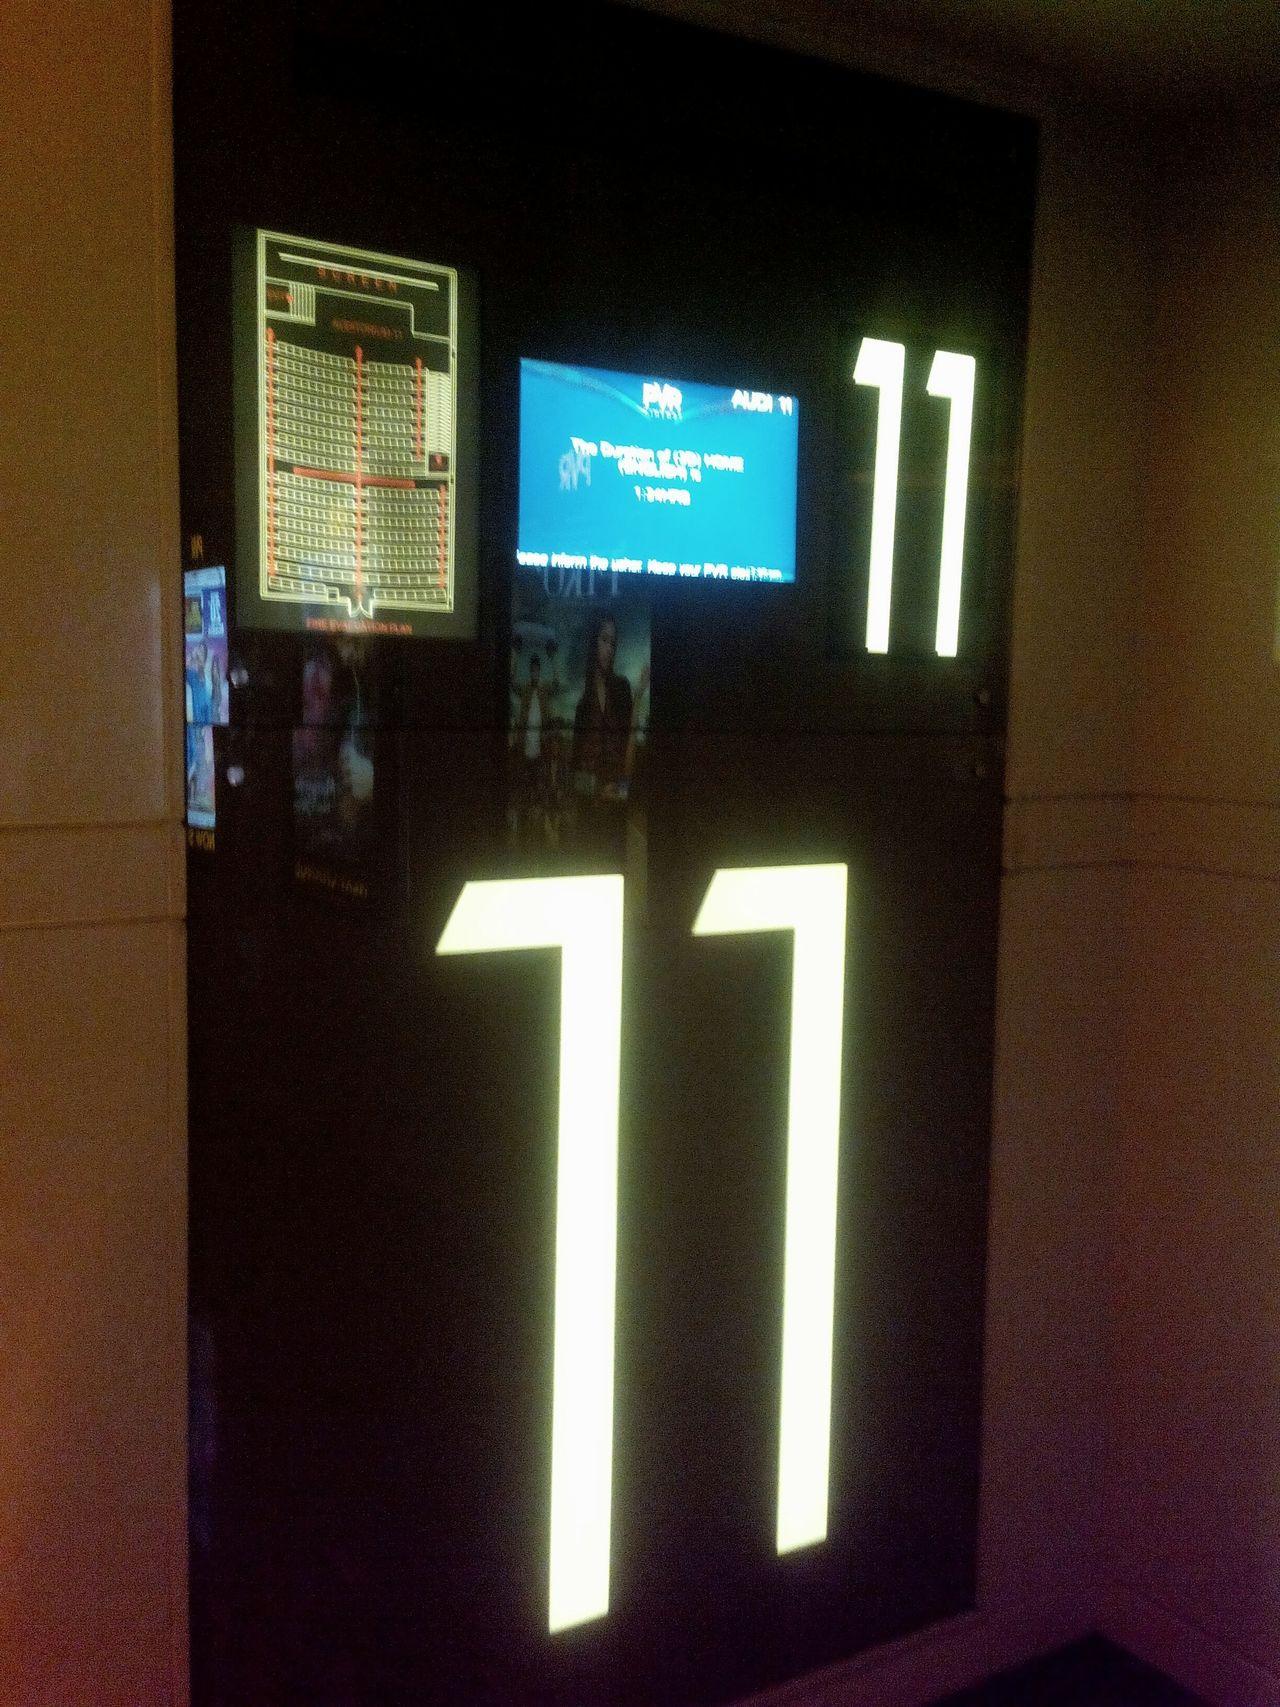 Illuminated Digital Display 11:11 Make A Wish